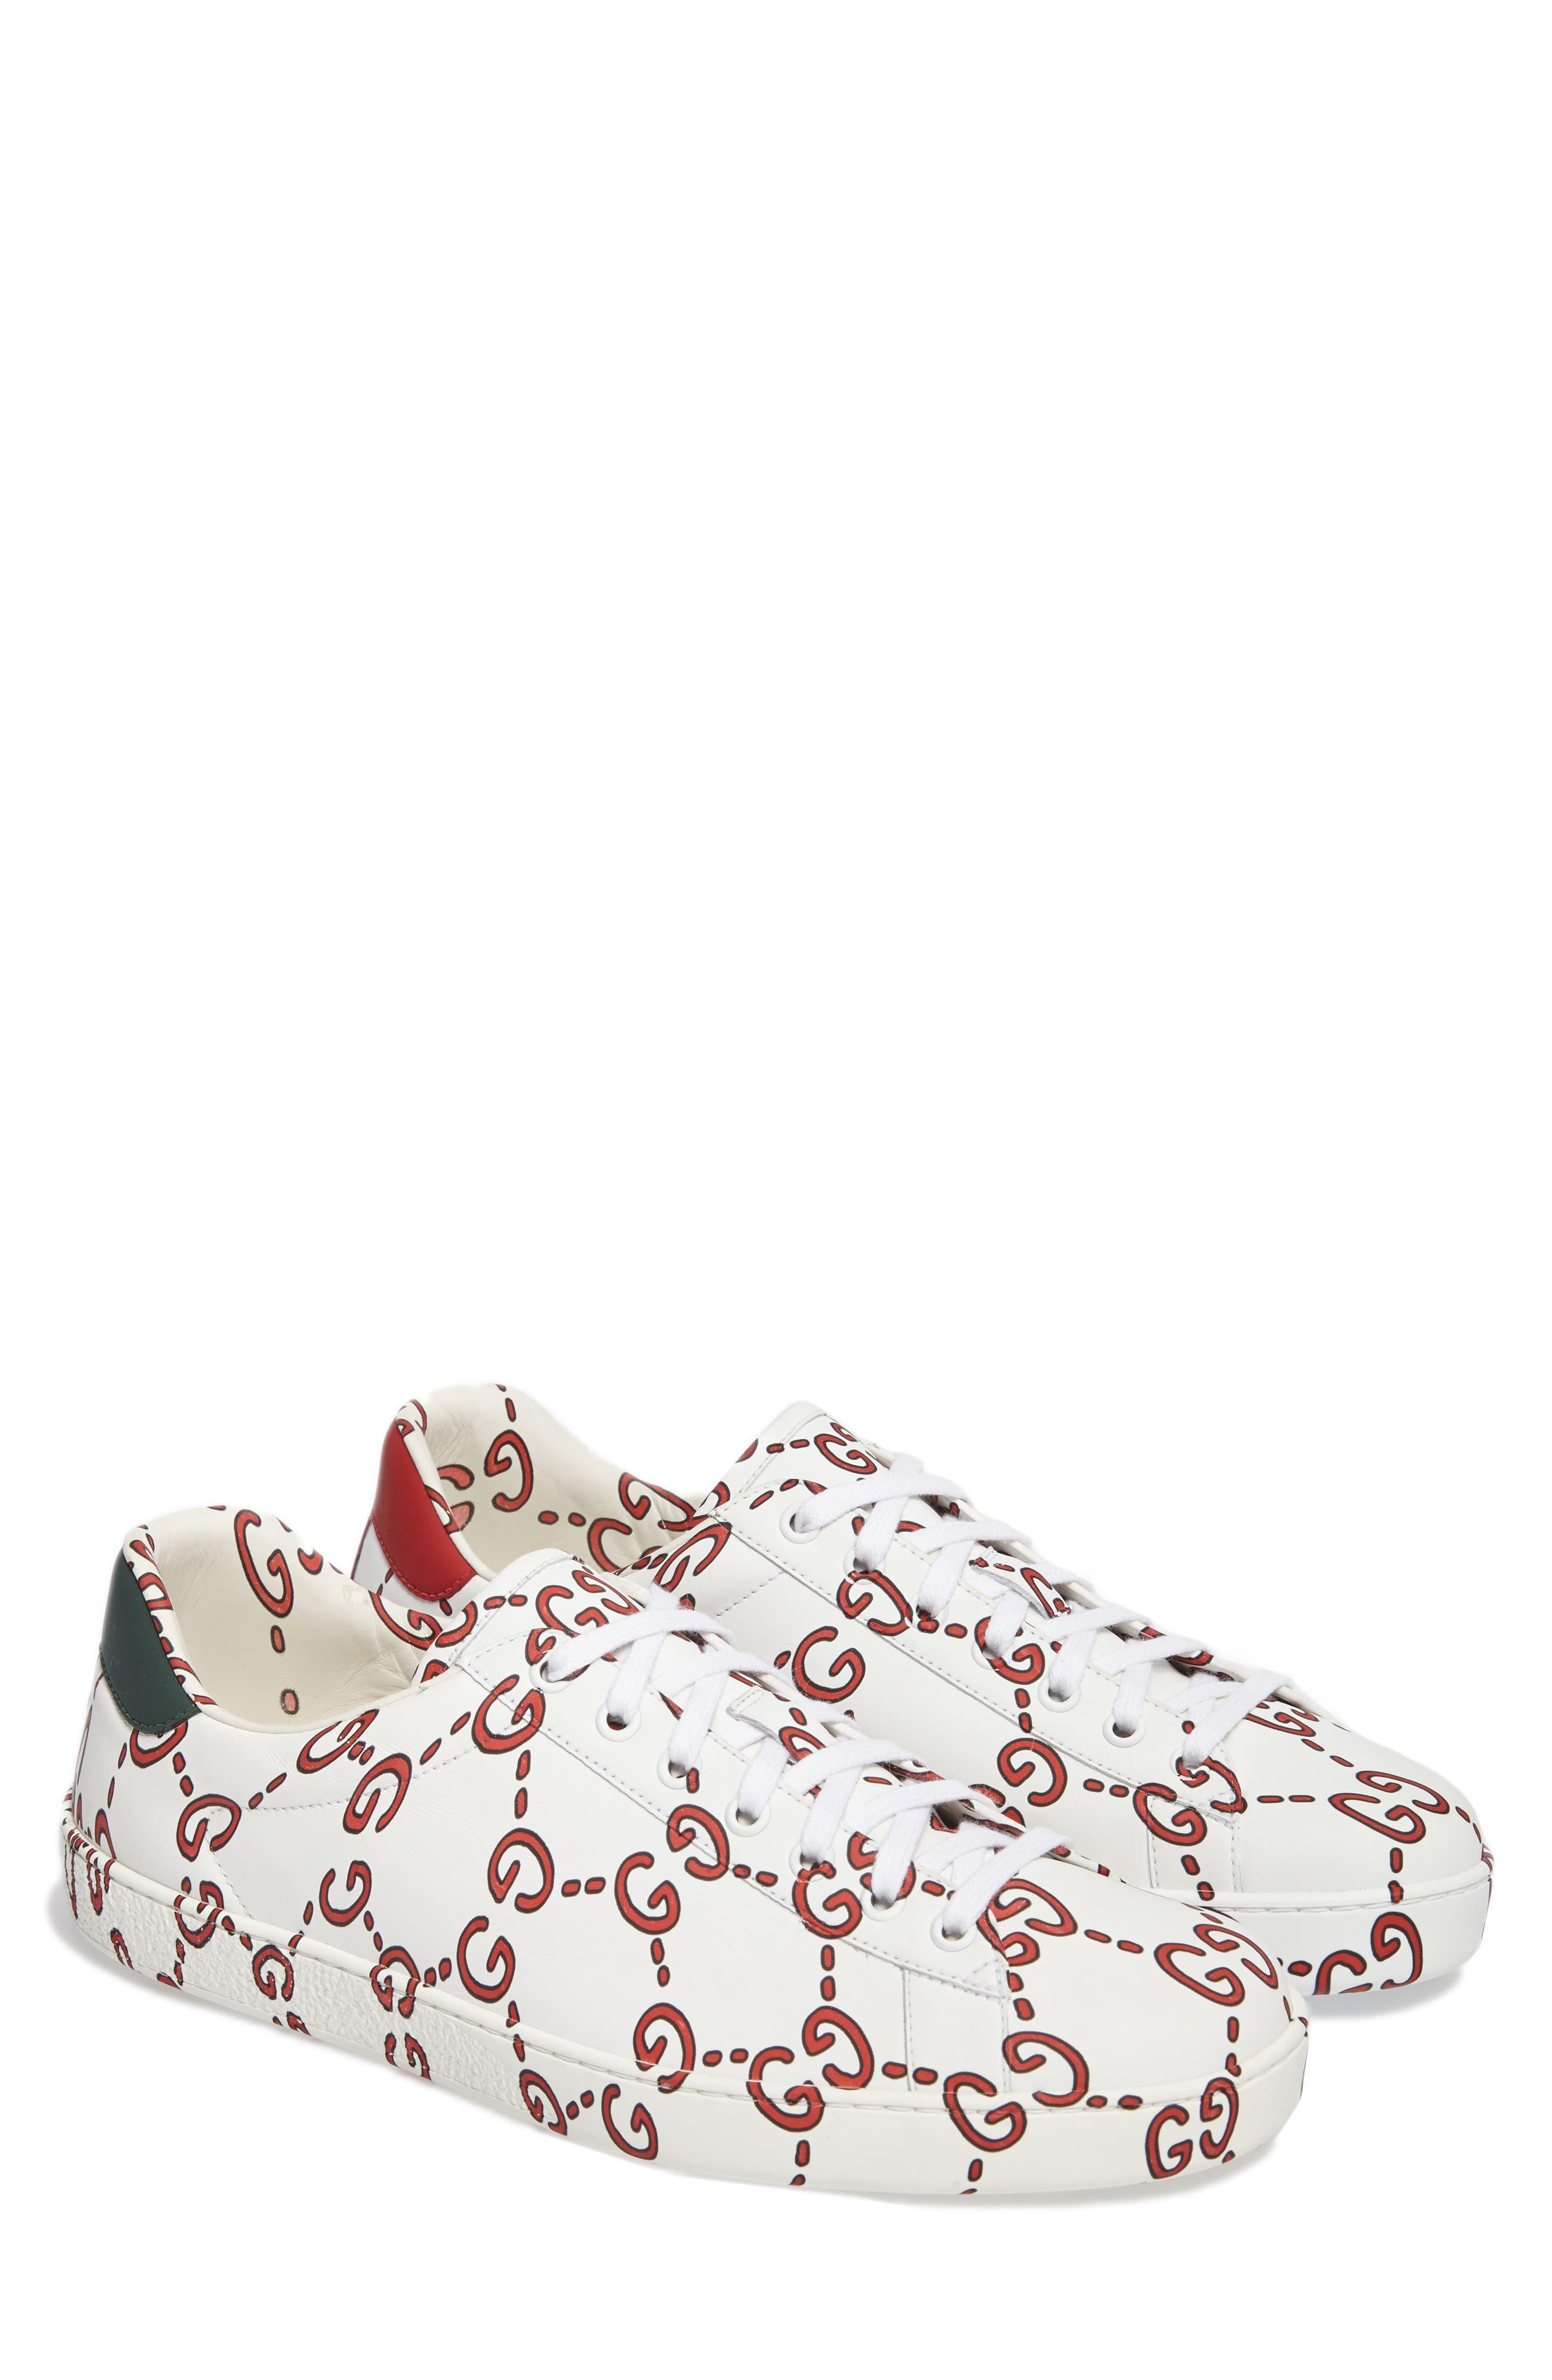 c3780c9254cb Gucci Men s Sneakers Shoes   Accessories